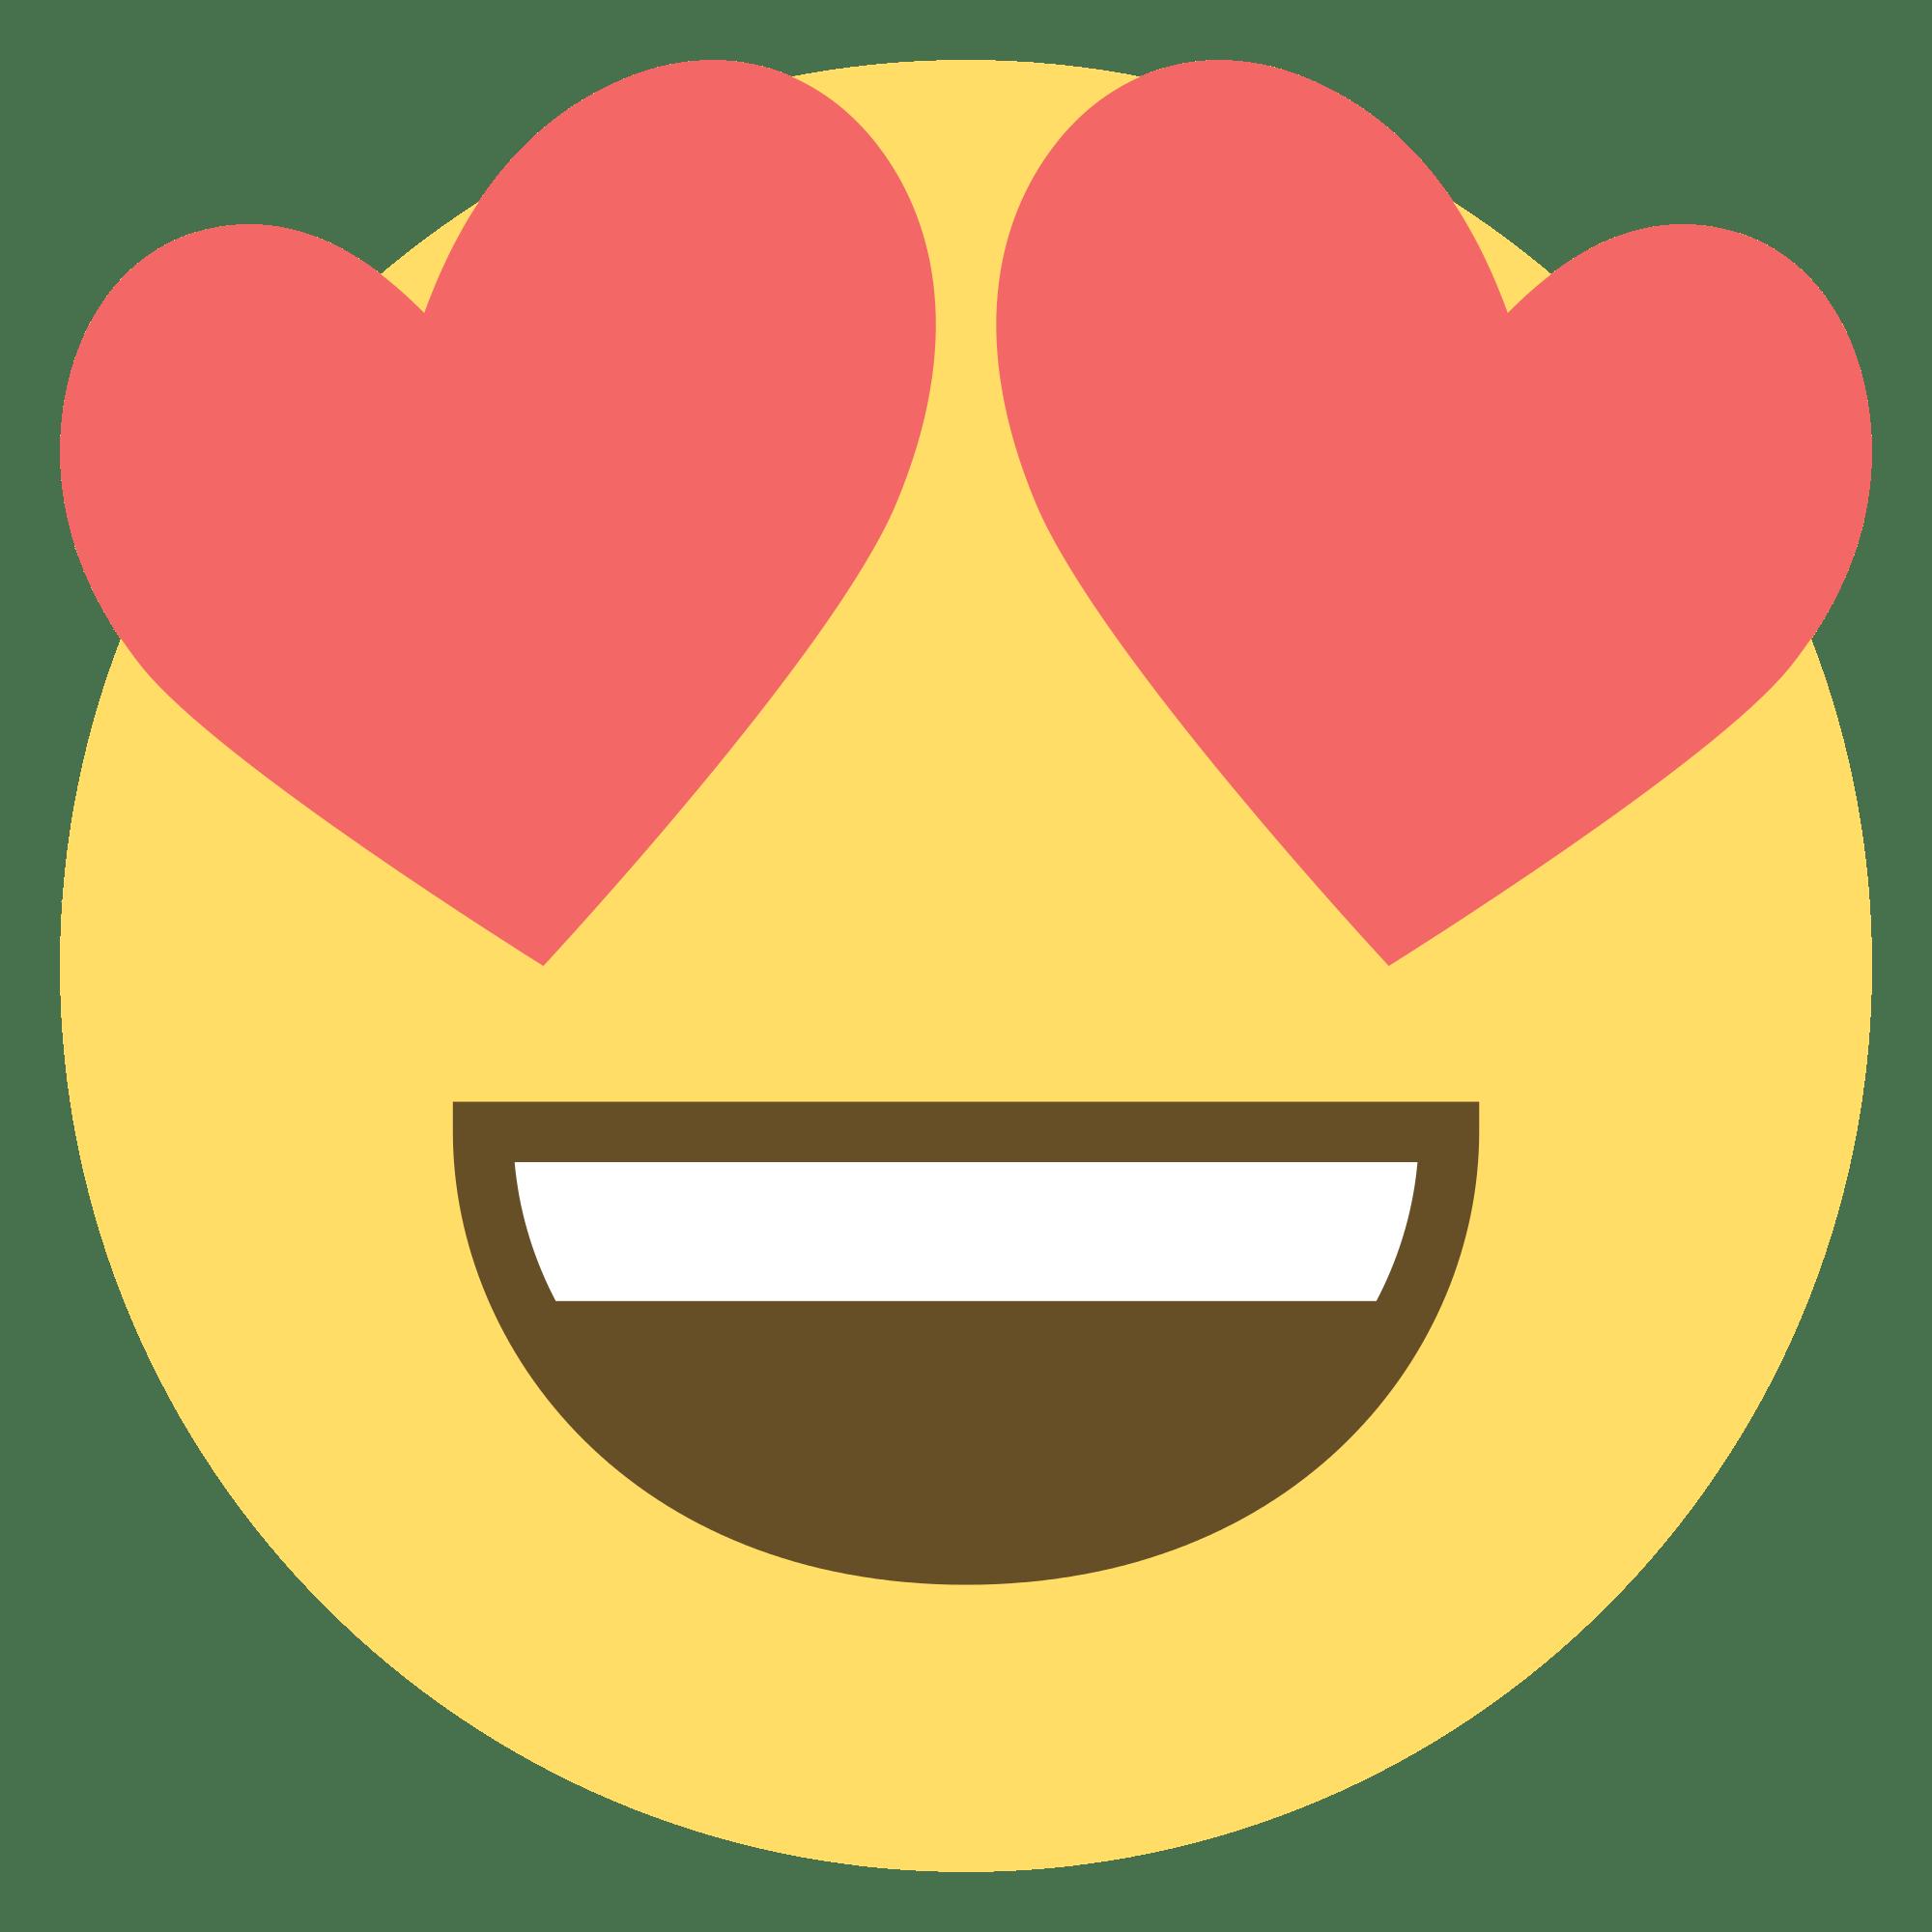 Free emoji money clipart clip art freeuse library Money Bag Emoji transparent PNG - StickPNG clip art freeuse library